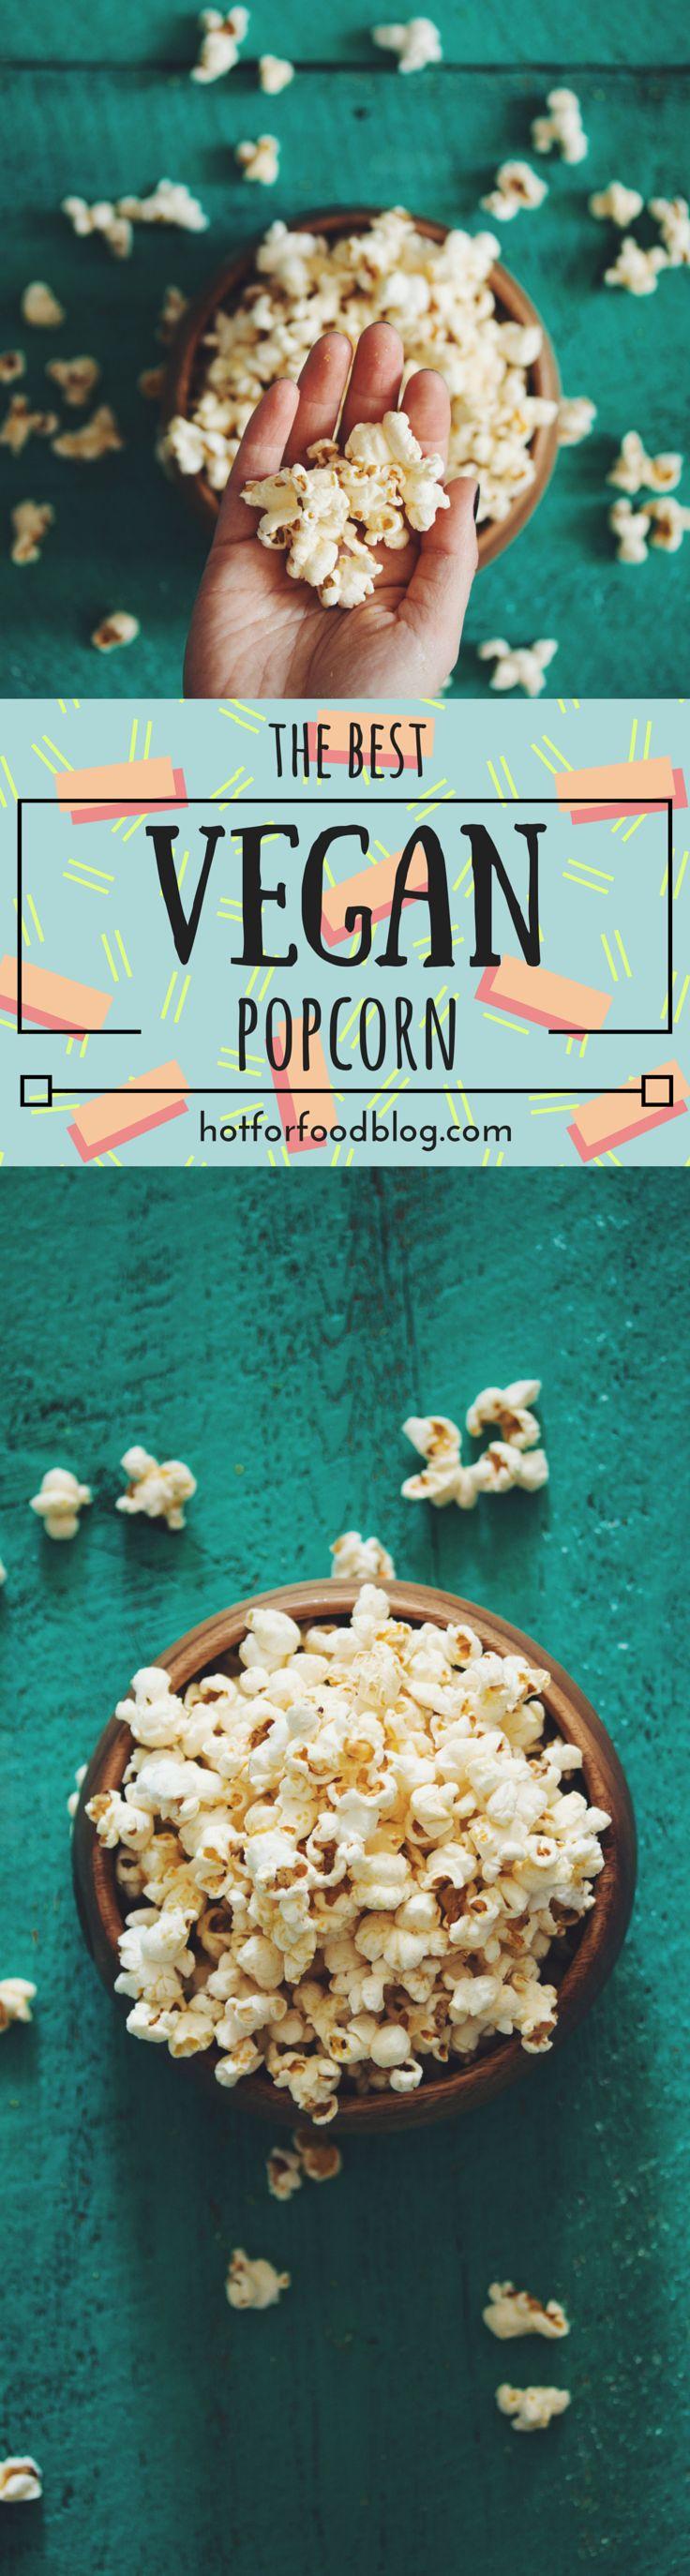 the best vegan popcorn | RECIPE on hotforfoodblog.com